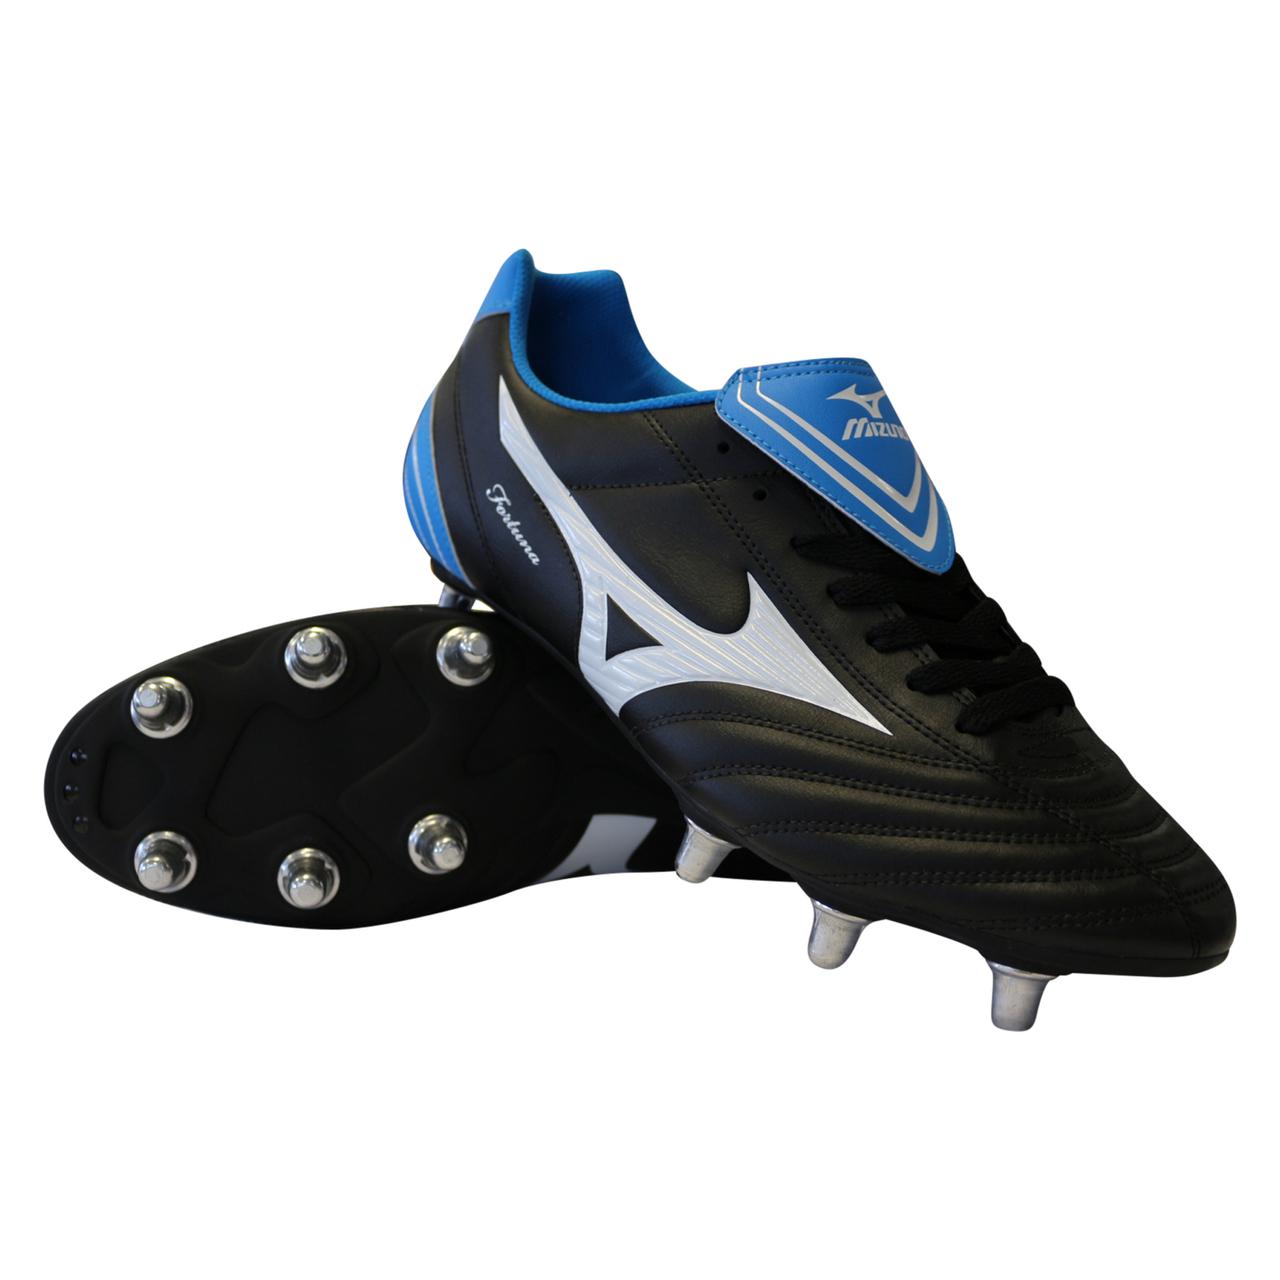 buy online 64e35 46f35 Mizuno Fortuna 4 SG Rugby Boots Black White Blue